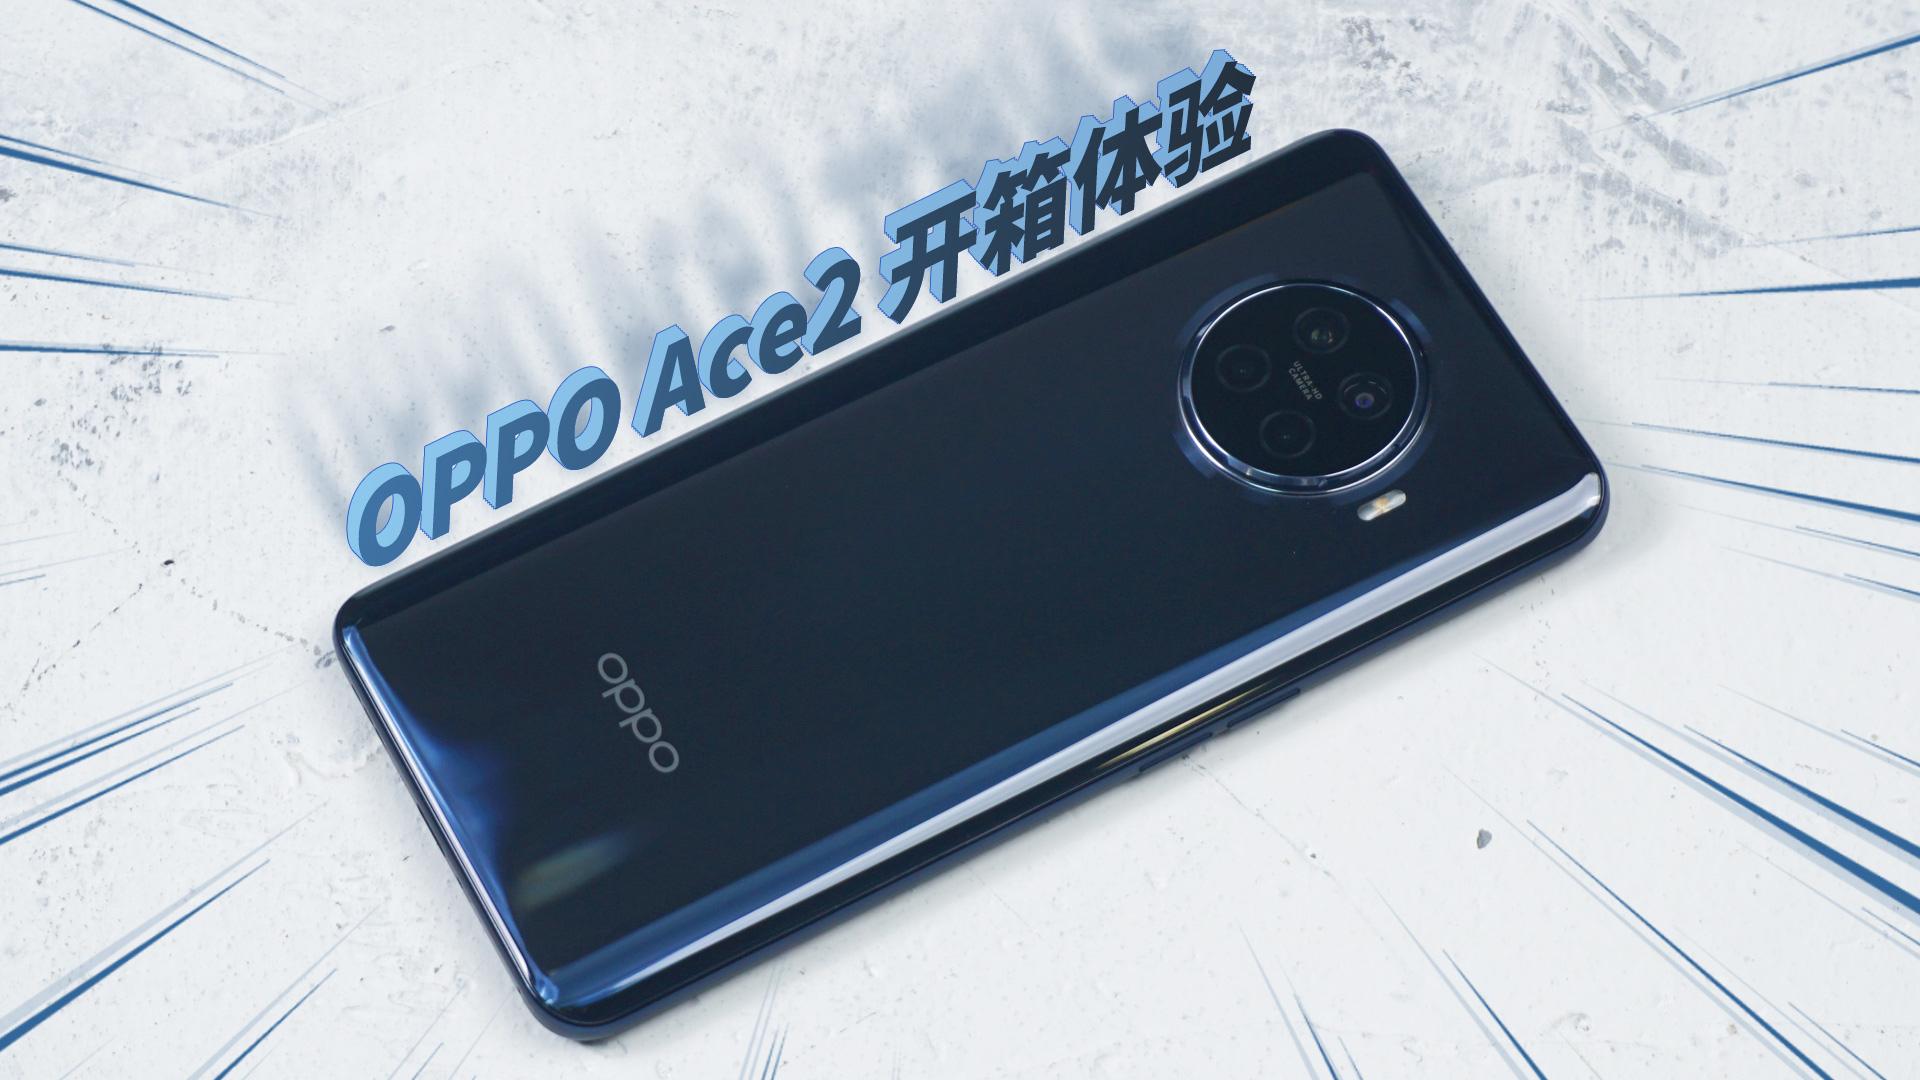 OPPO Ace2开箱:性能够强系统流畅/轻薄机身握持舒适